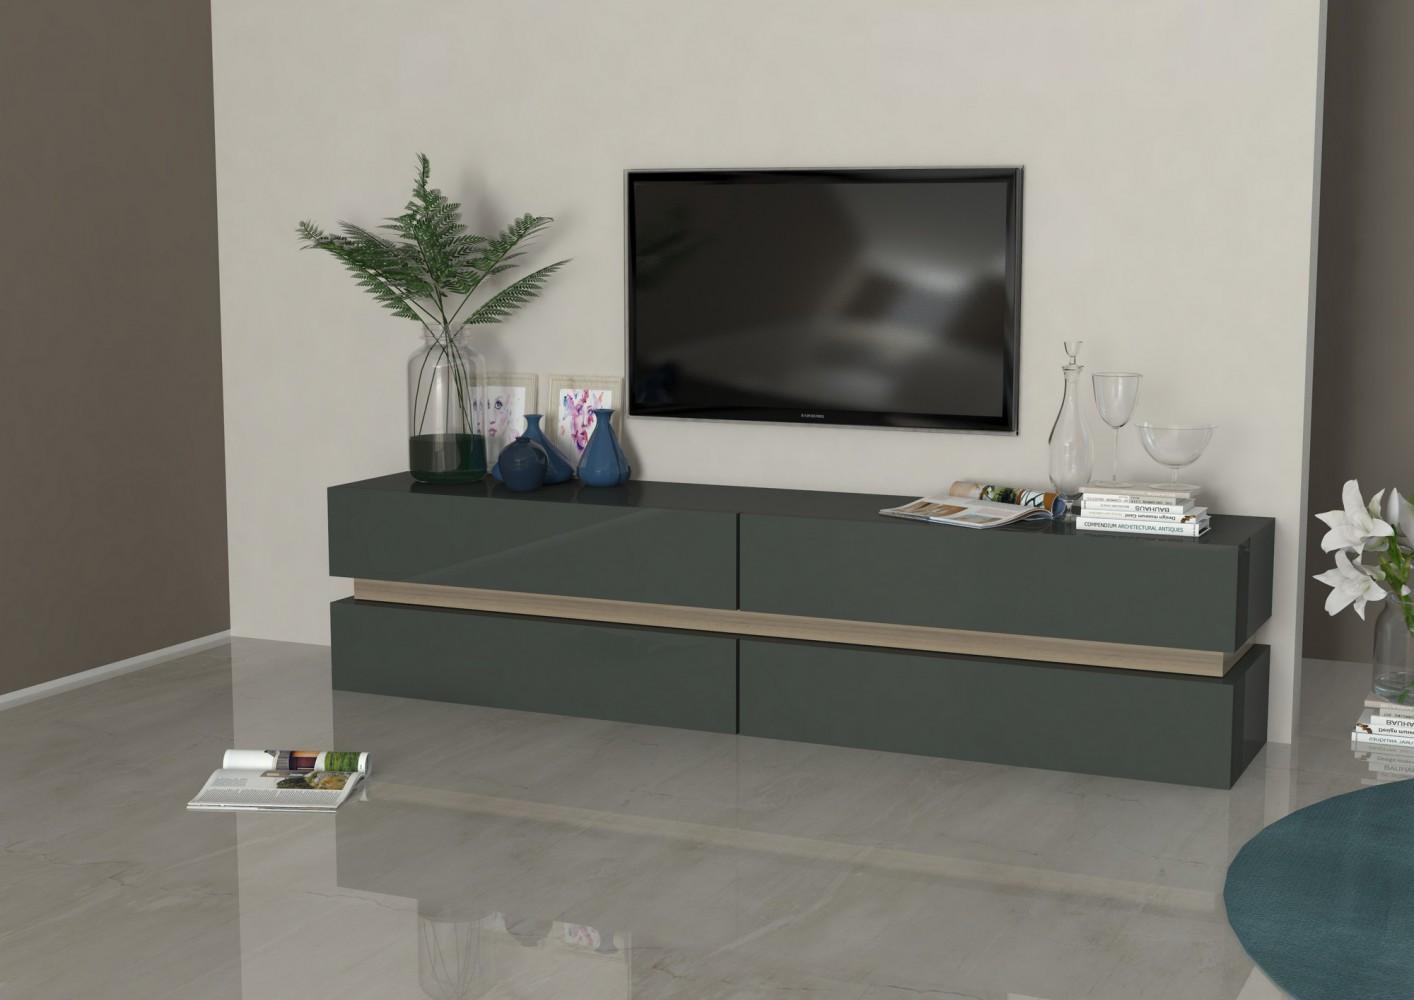 Tecnos ATHENA Lowboard, 200cm Wohnwand Mediwand Italian Design ...